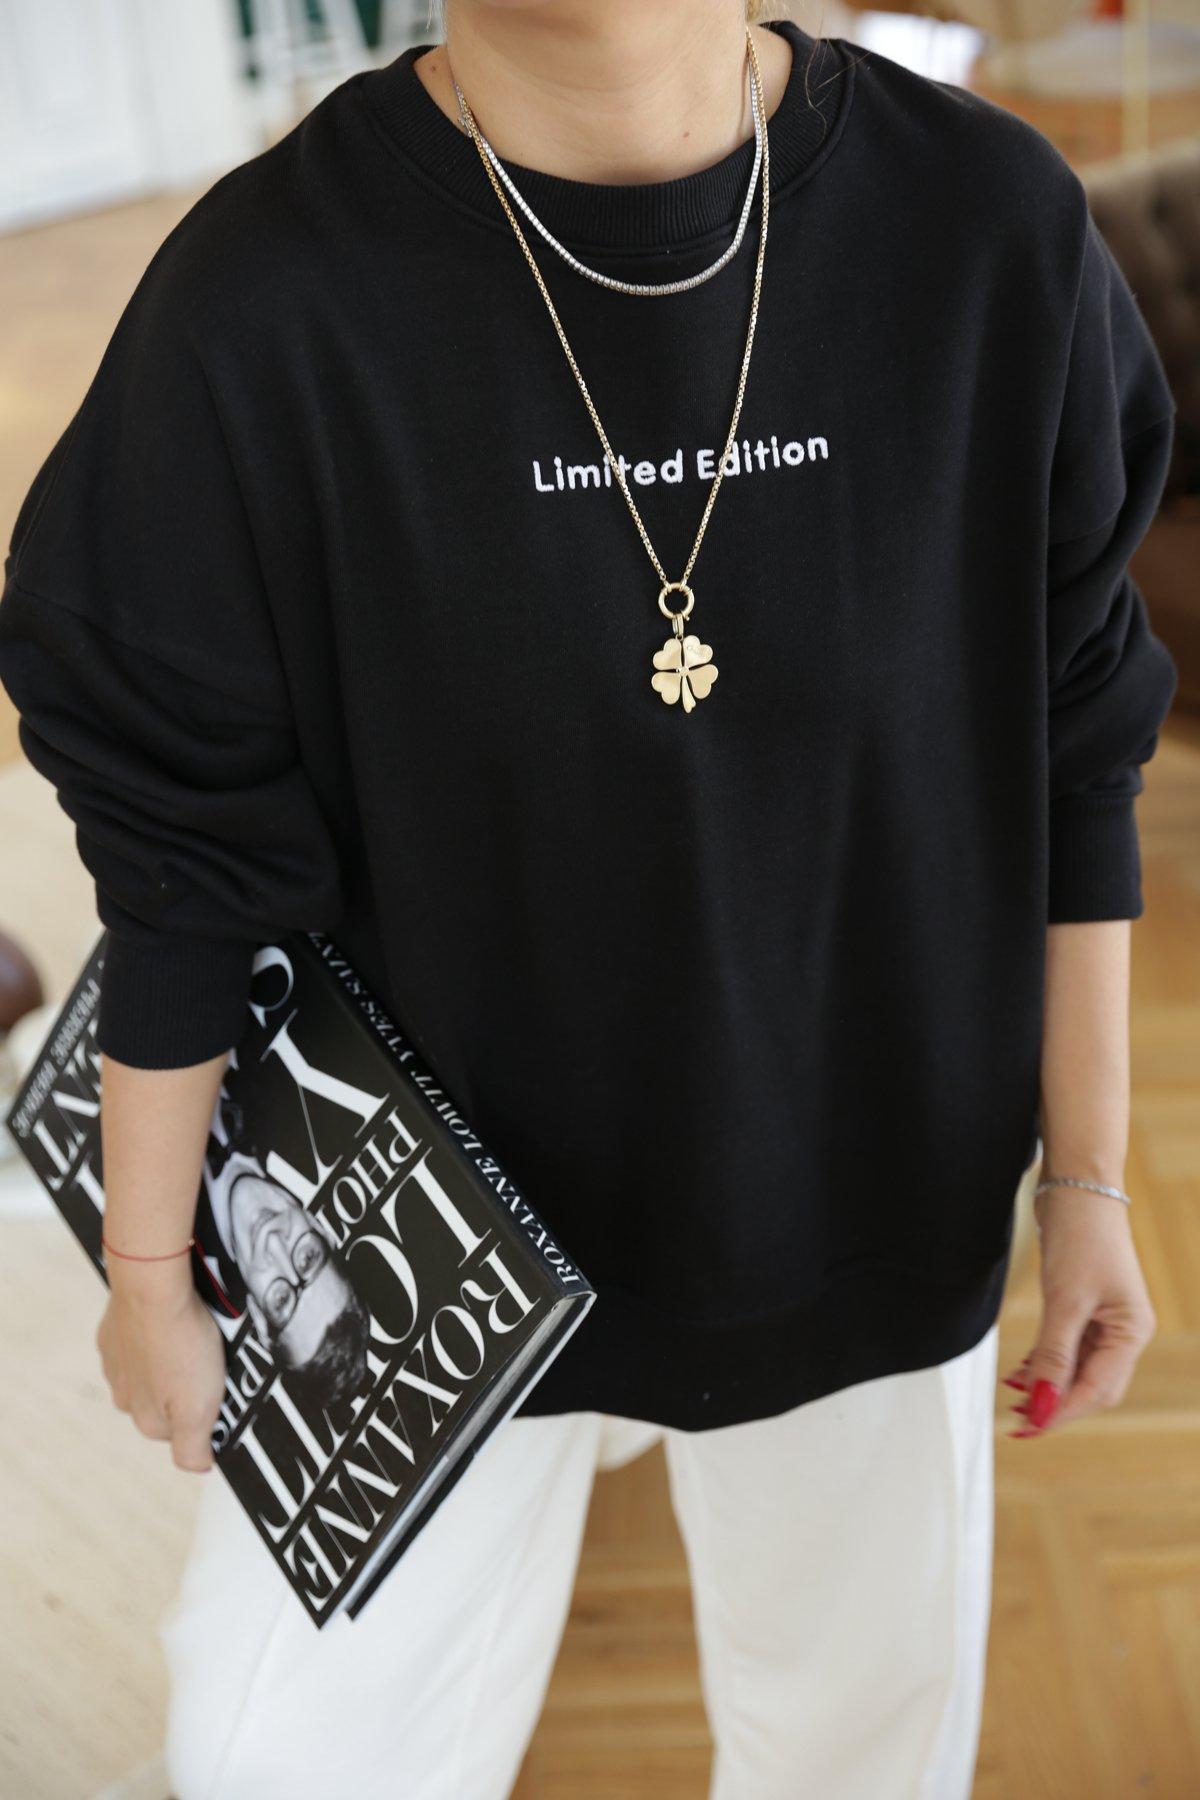 Limited Edition İşlemeli Sweatshirt